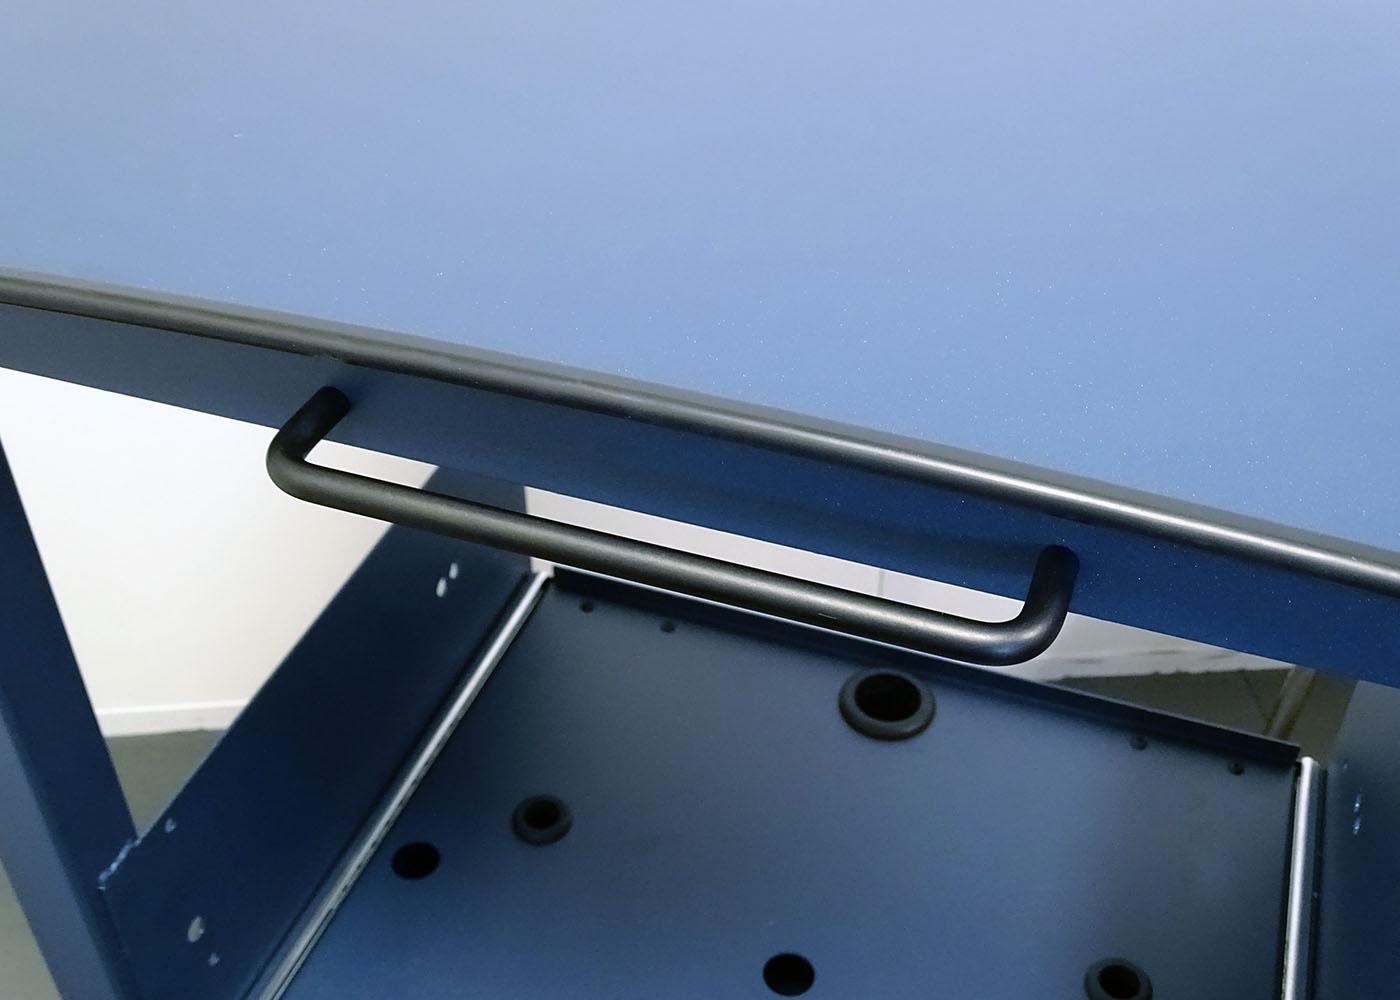 NX557 – Chariot mécano-soudé – Détail poignée